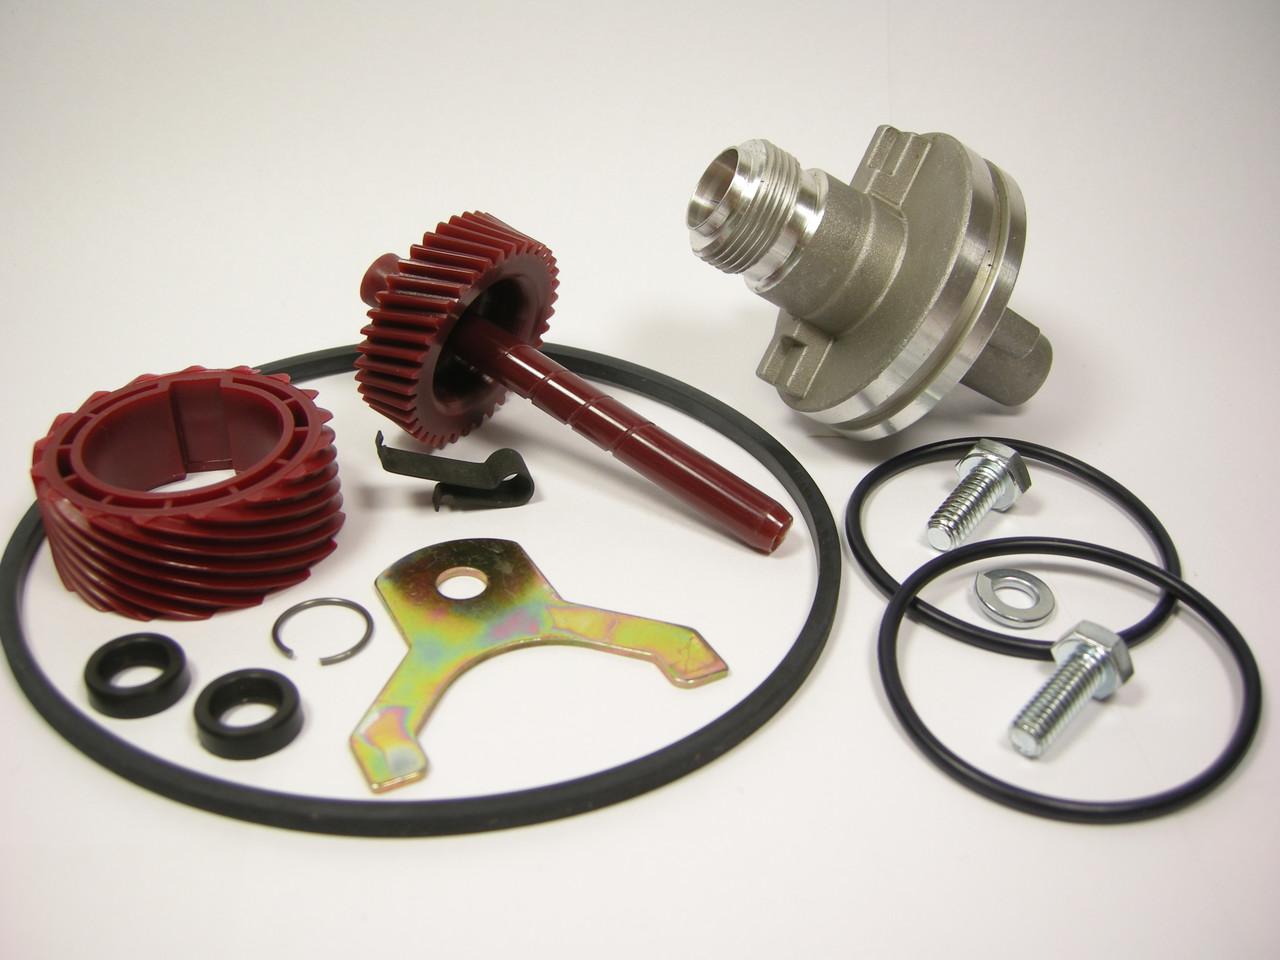 700R4 TH350 17 & 37 Tooth Speedo Kit Gears Housing Speedometer Parts